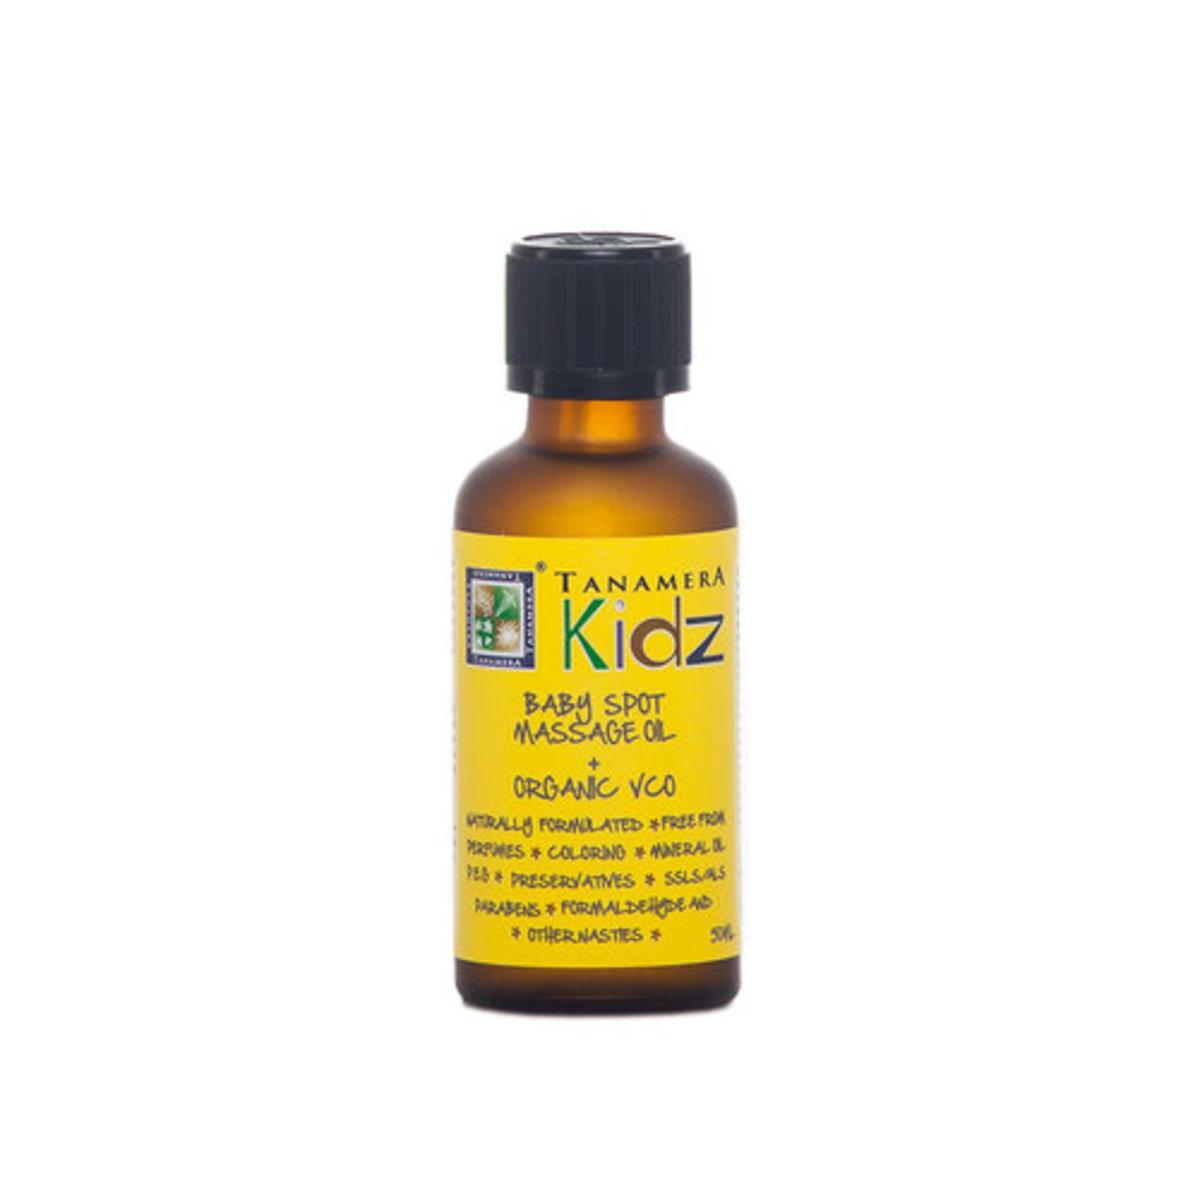 Kidz Baby Spot Massage Oil + Organic VCO